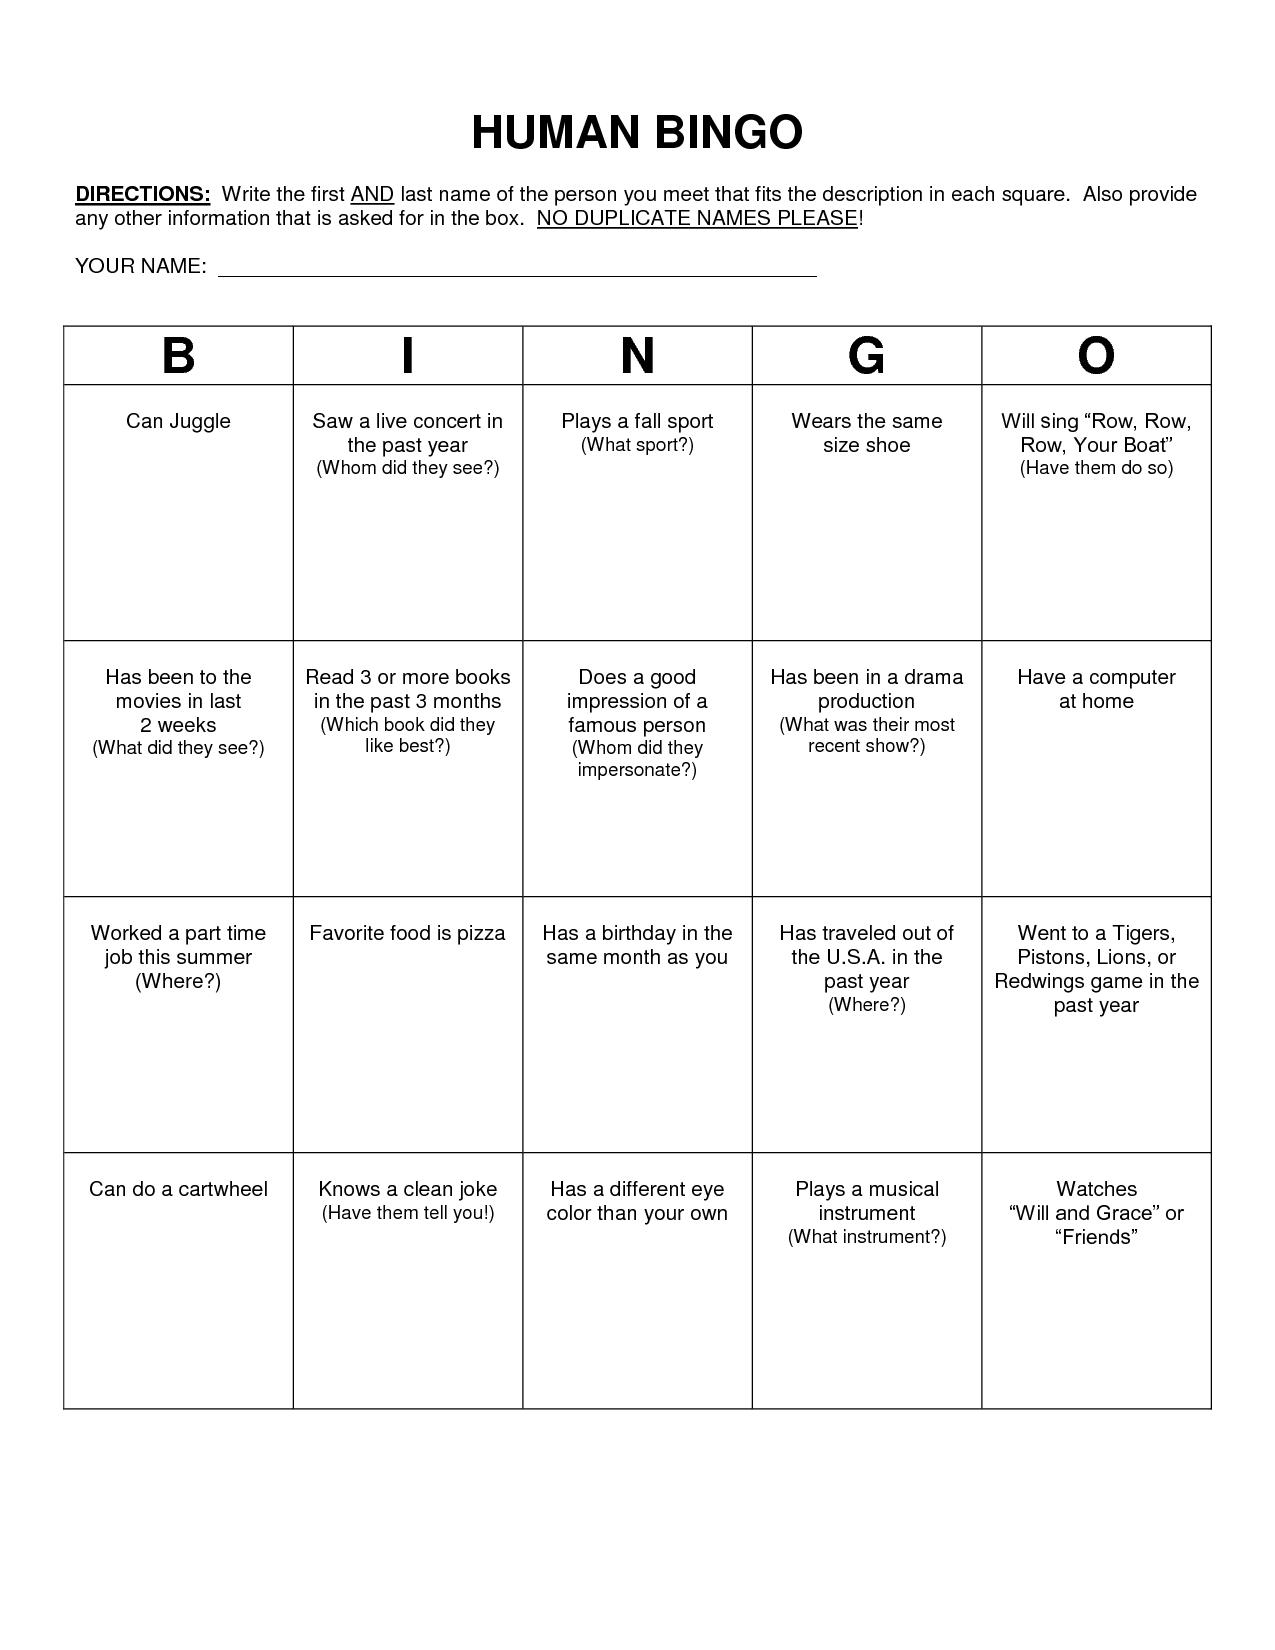 Human Bingo Scavenger Hunt Template | Human Bingo, Bingo